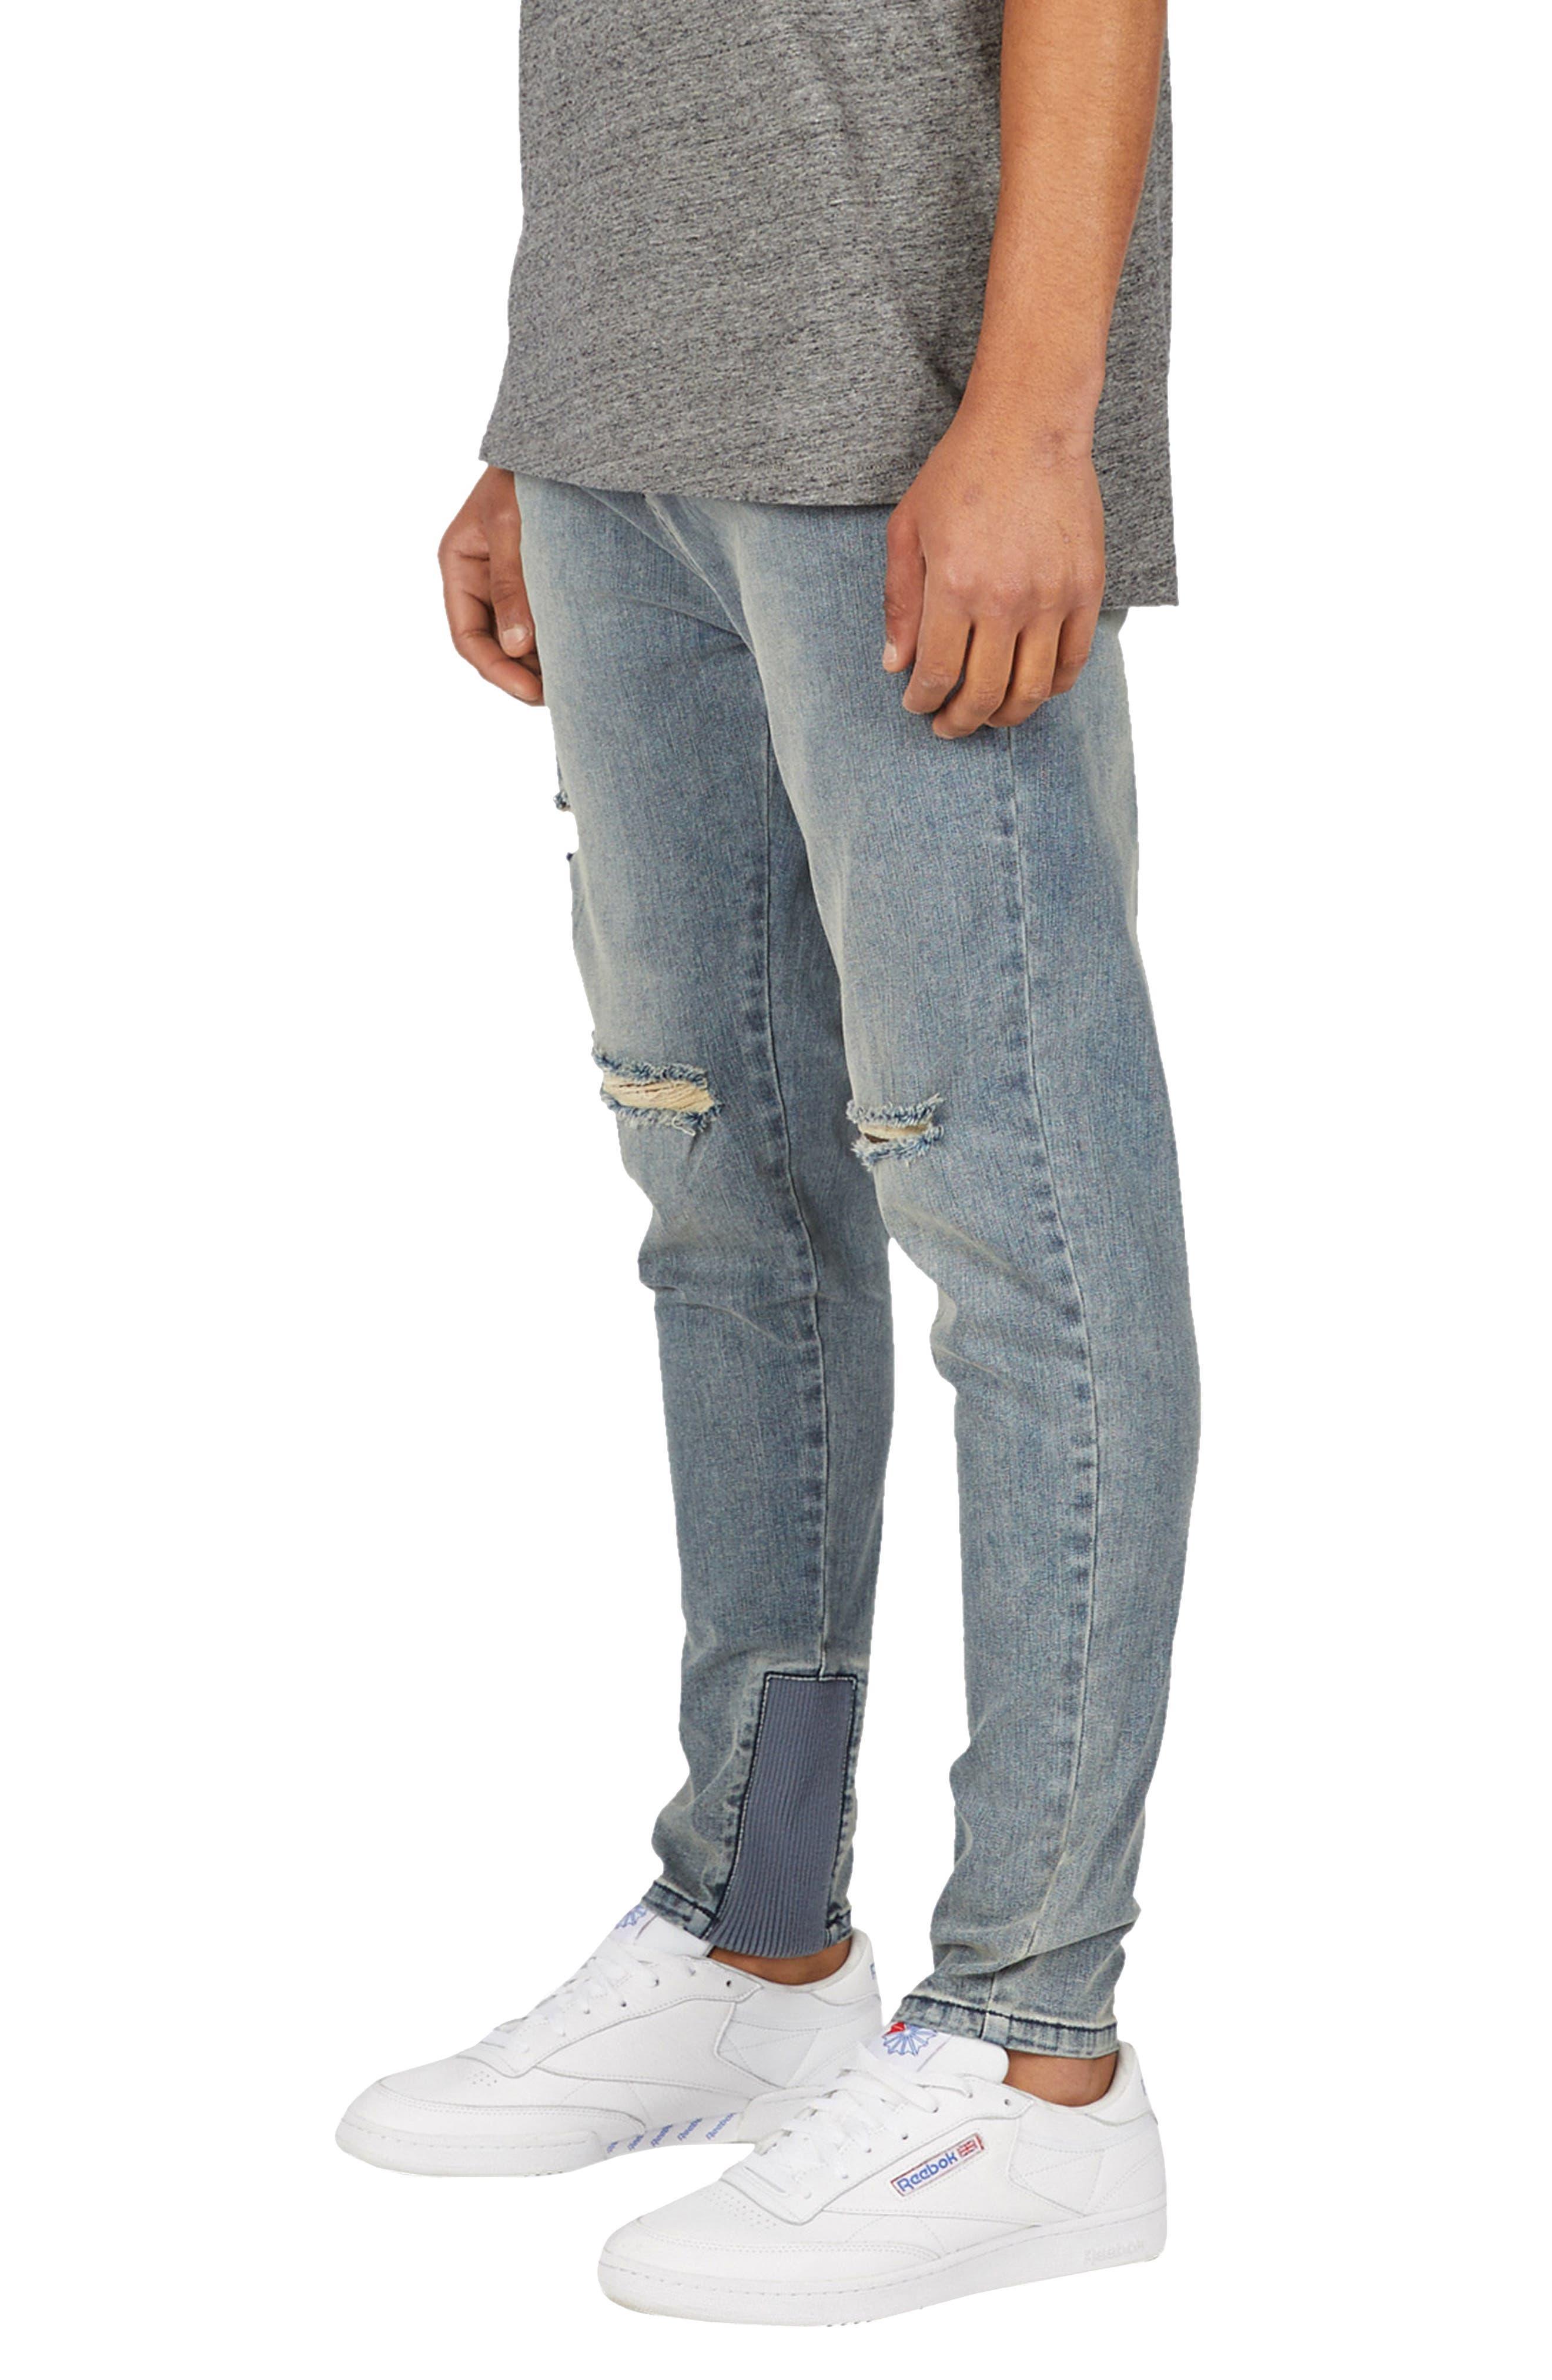 Sharpshot Slouchy Slim Fit Jeans,                             Alternate thumbnail 4, color,